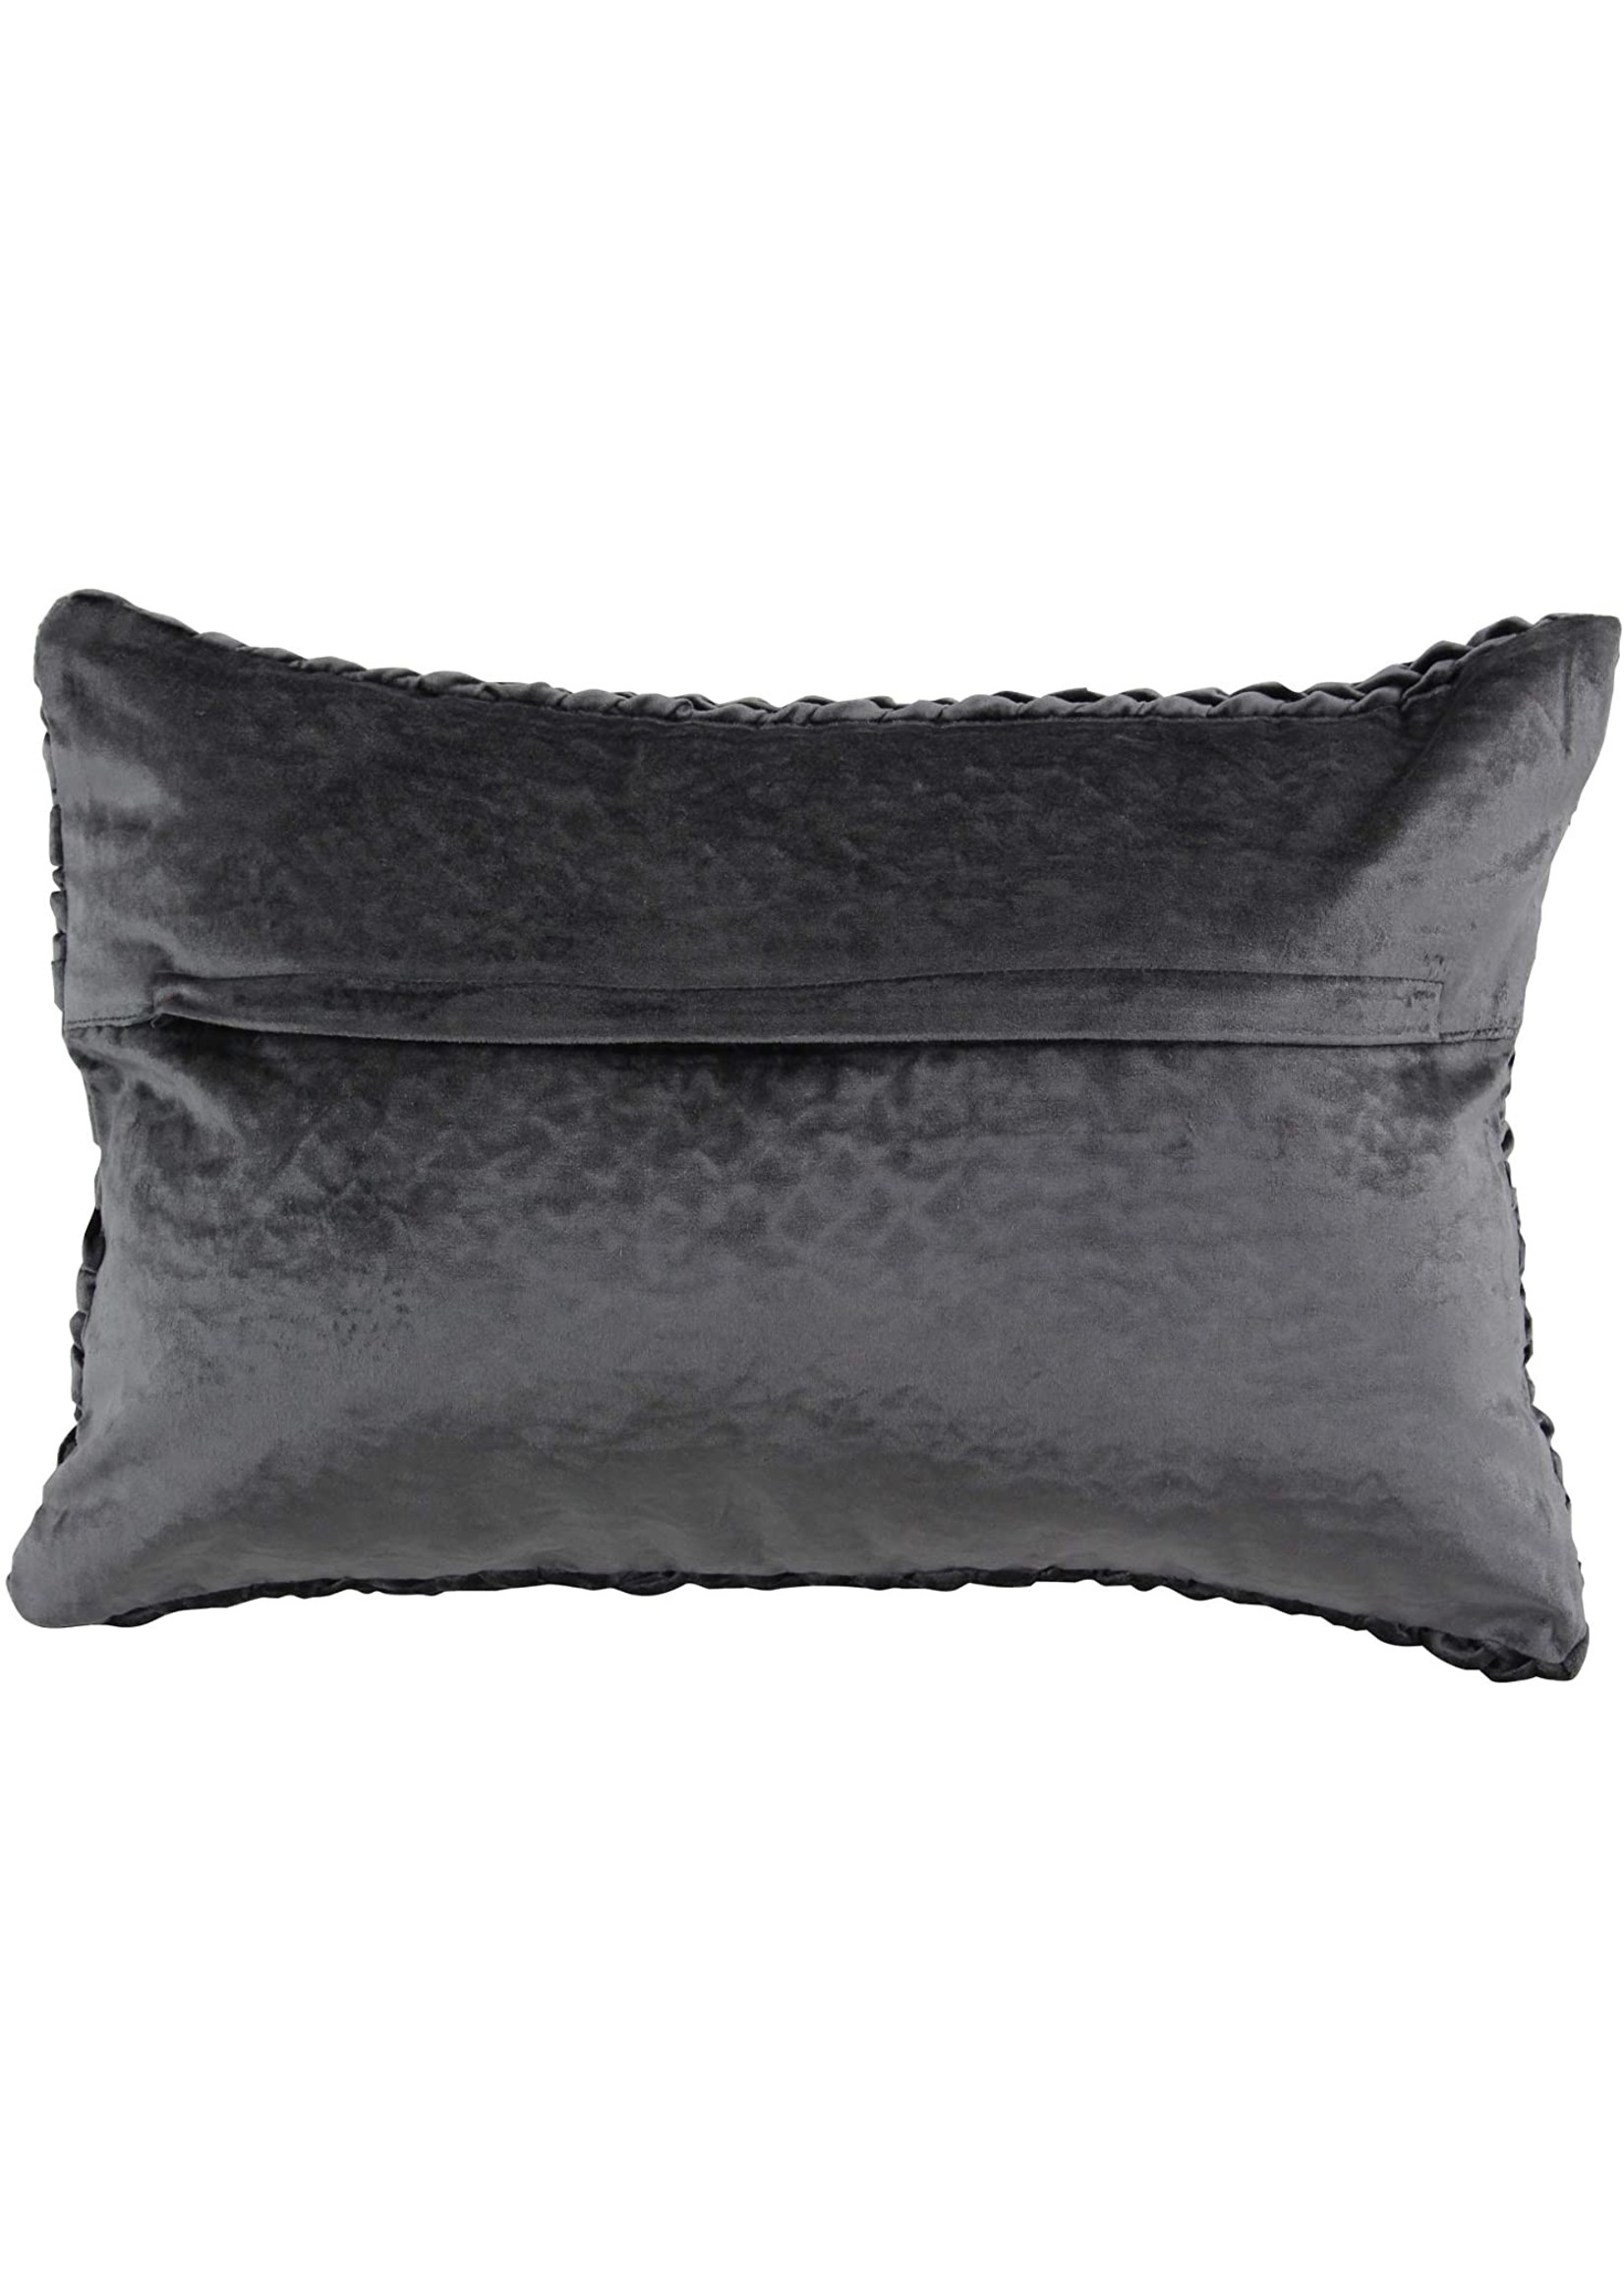 UMA Enterprises Cotton Velvet Black Lumbar Pillow